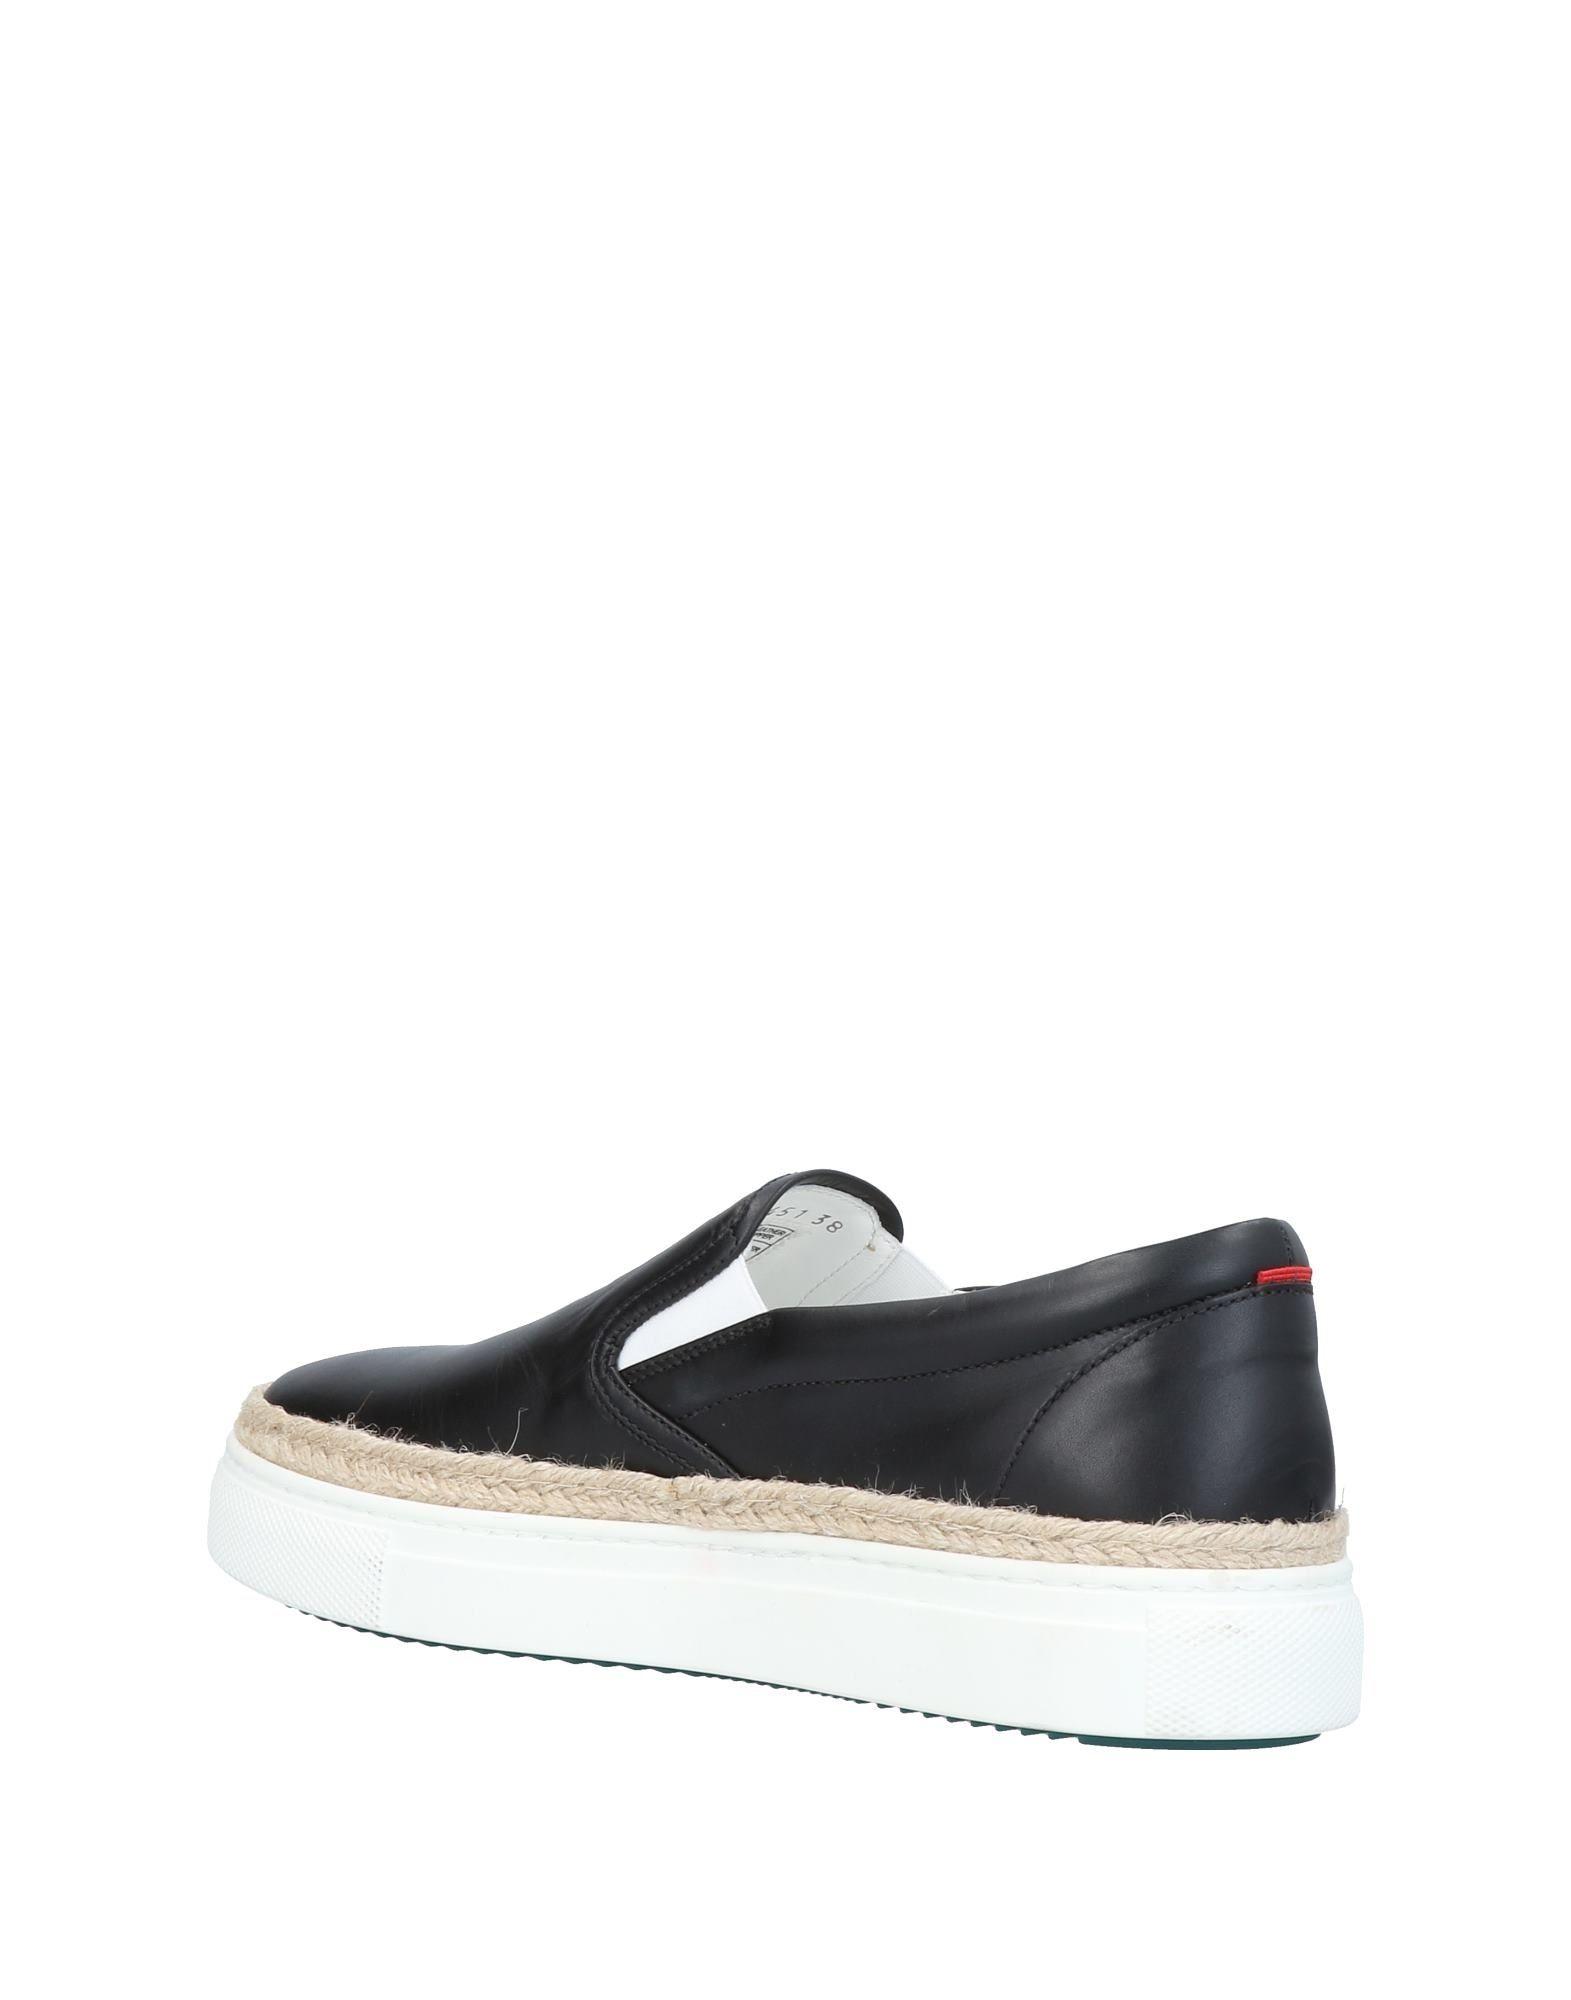 Gut um billige Schuhe zu  tragenHugo Boss Sneakers Damen  zu 11451986QT 65ac9b